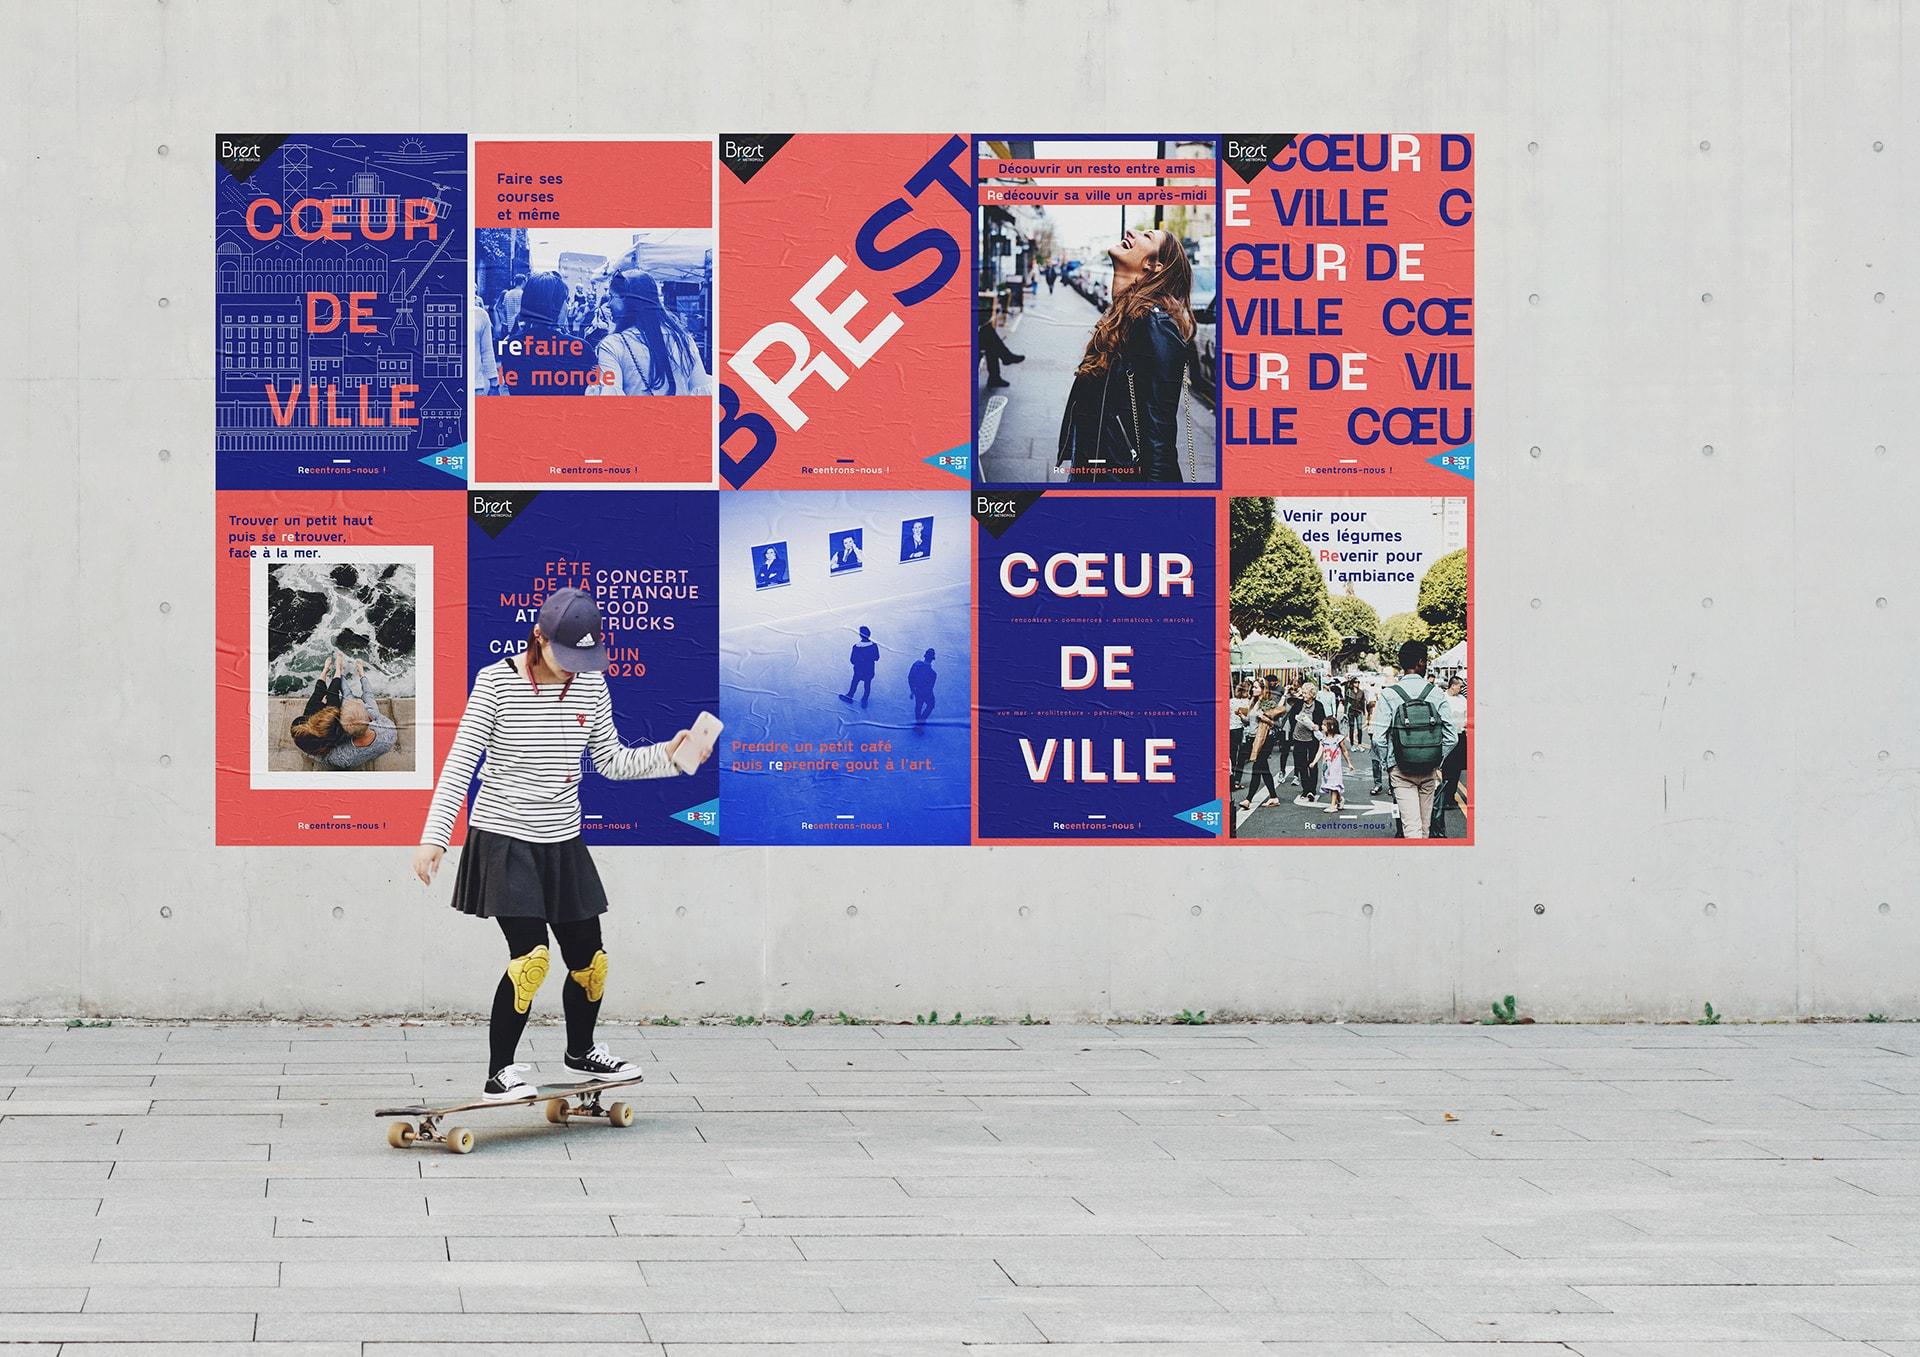 brest-affichage-urbain-6